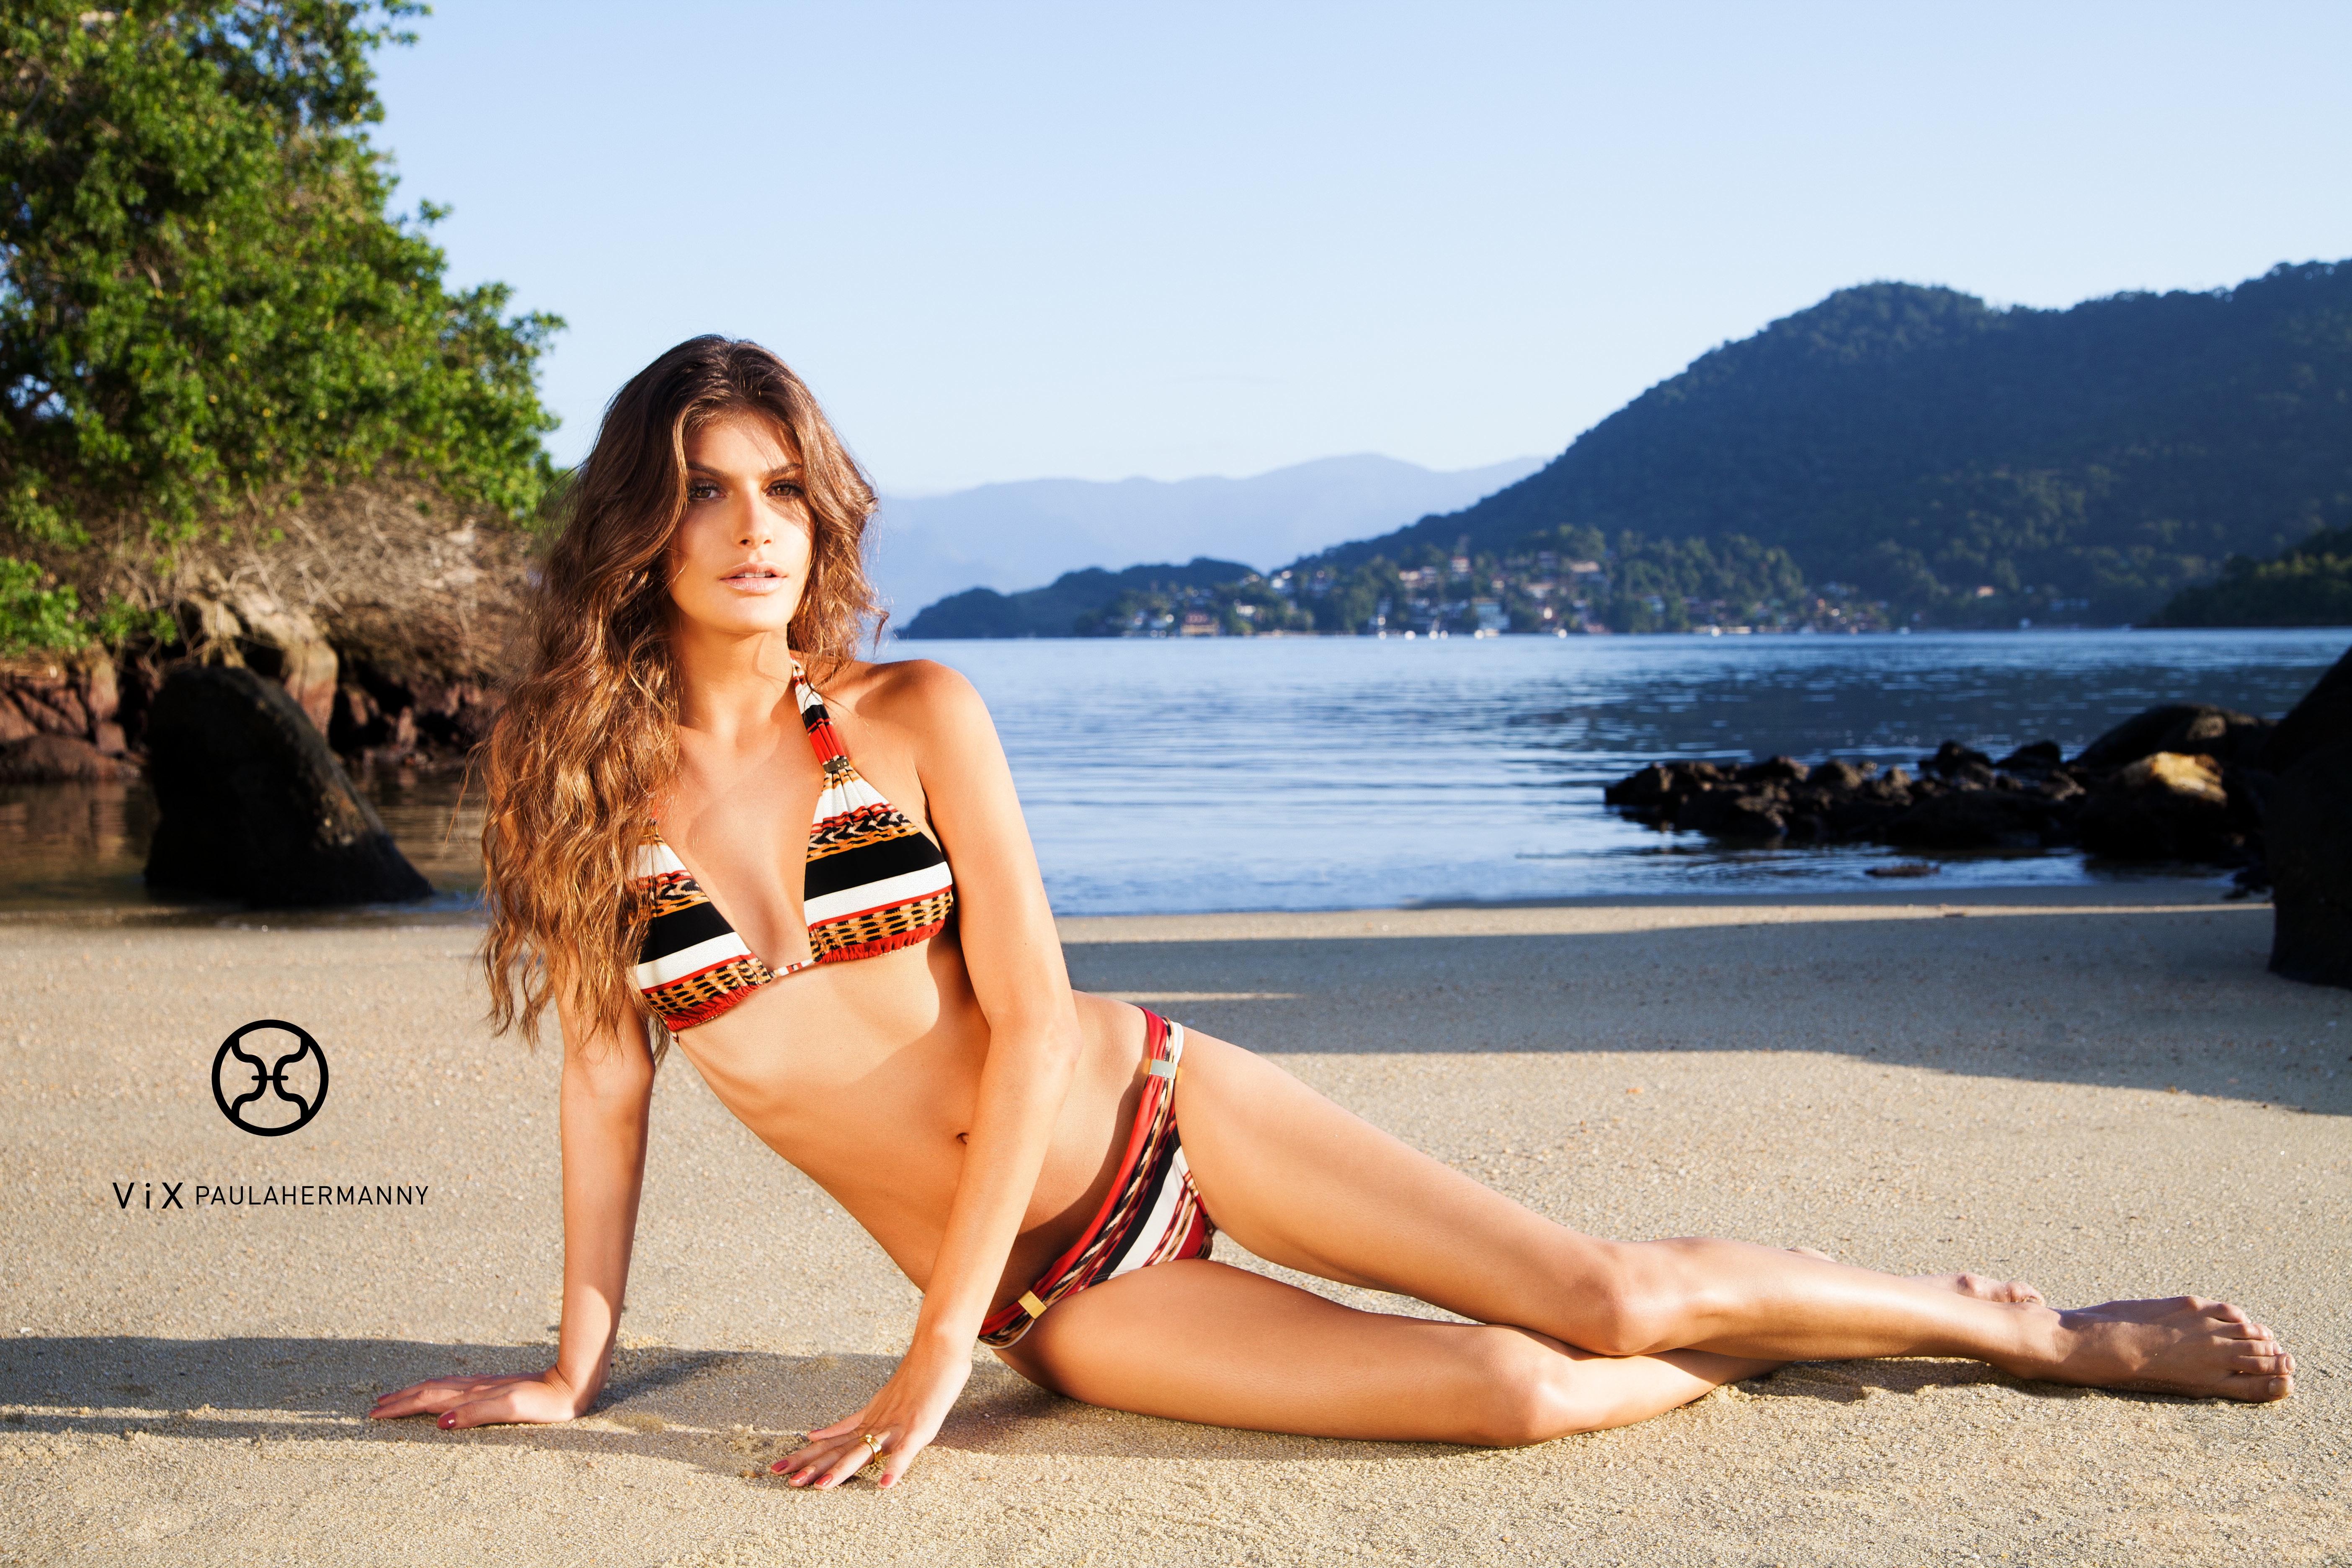 Bikini Set PHAX Swimwear Bikini 2012 Images | Crazy Gallery